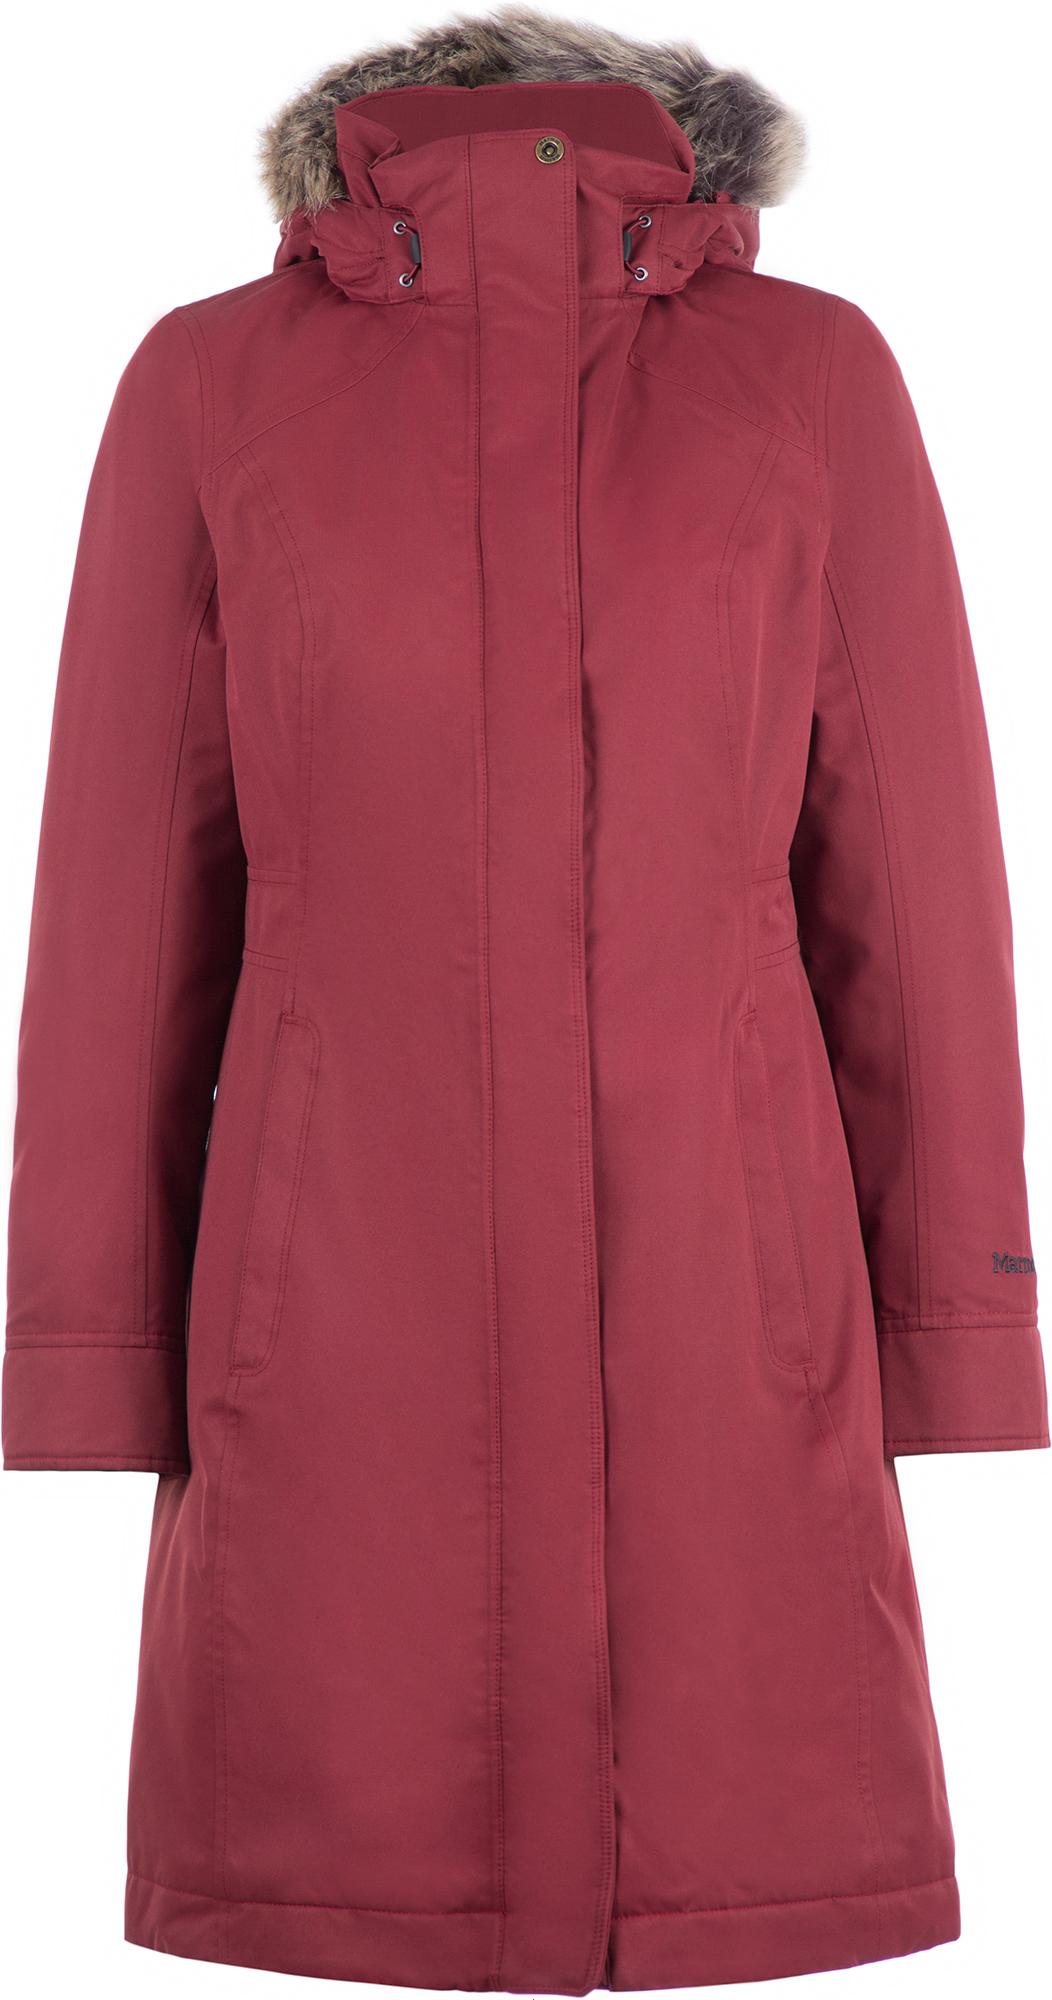 цена на Marmot Куртка пуховая женская Marmot Chelsea, размер 54-56